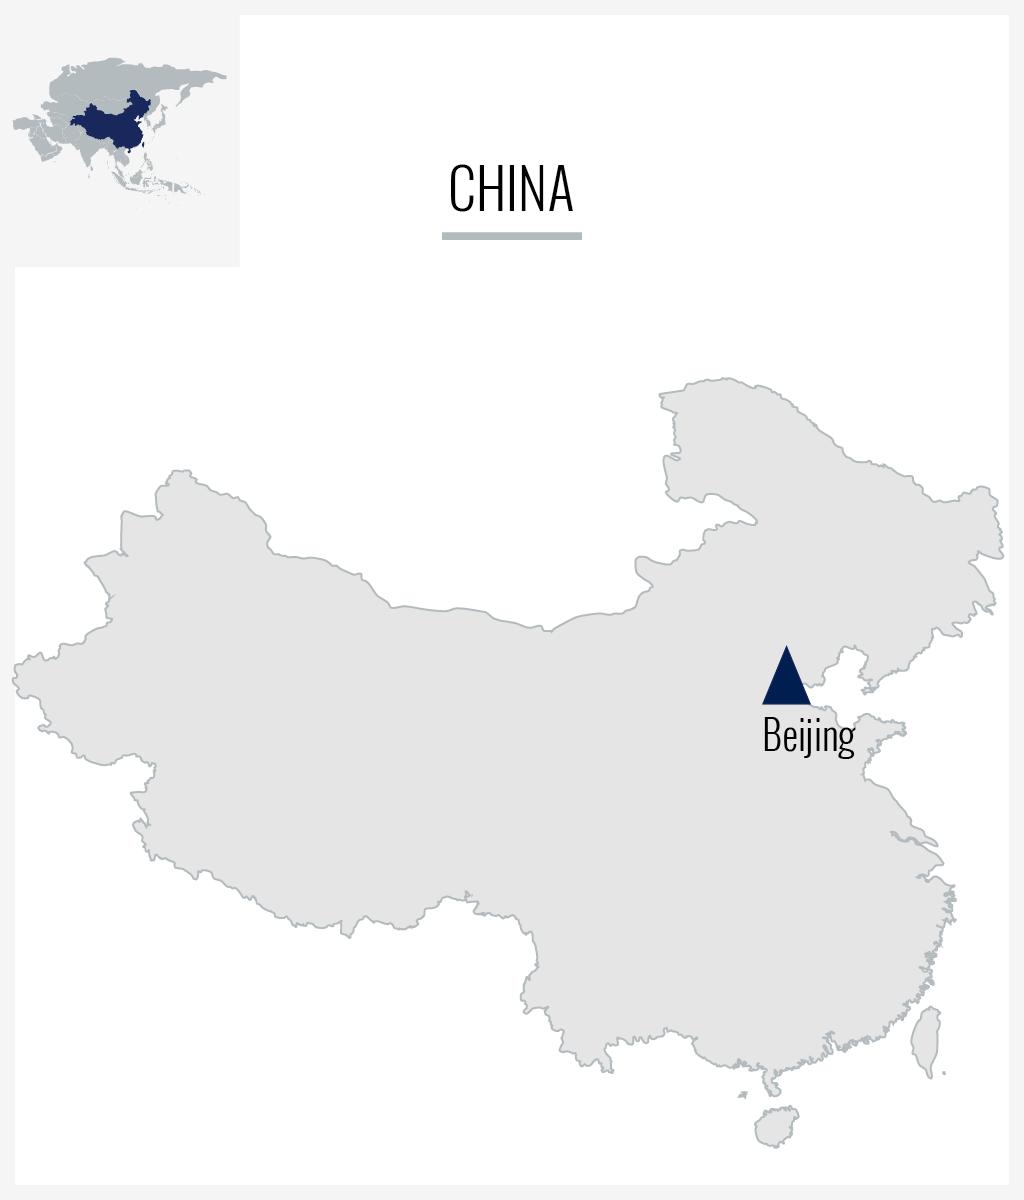 https://amt-sa.com/wp-content/uploads/2019/08/cartes-CHINA.jpg